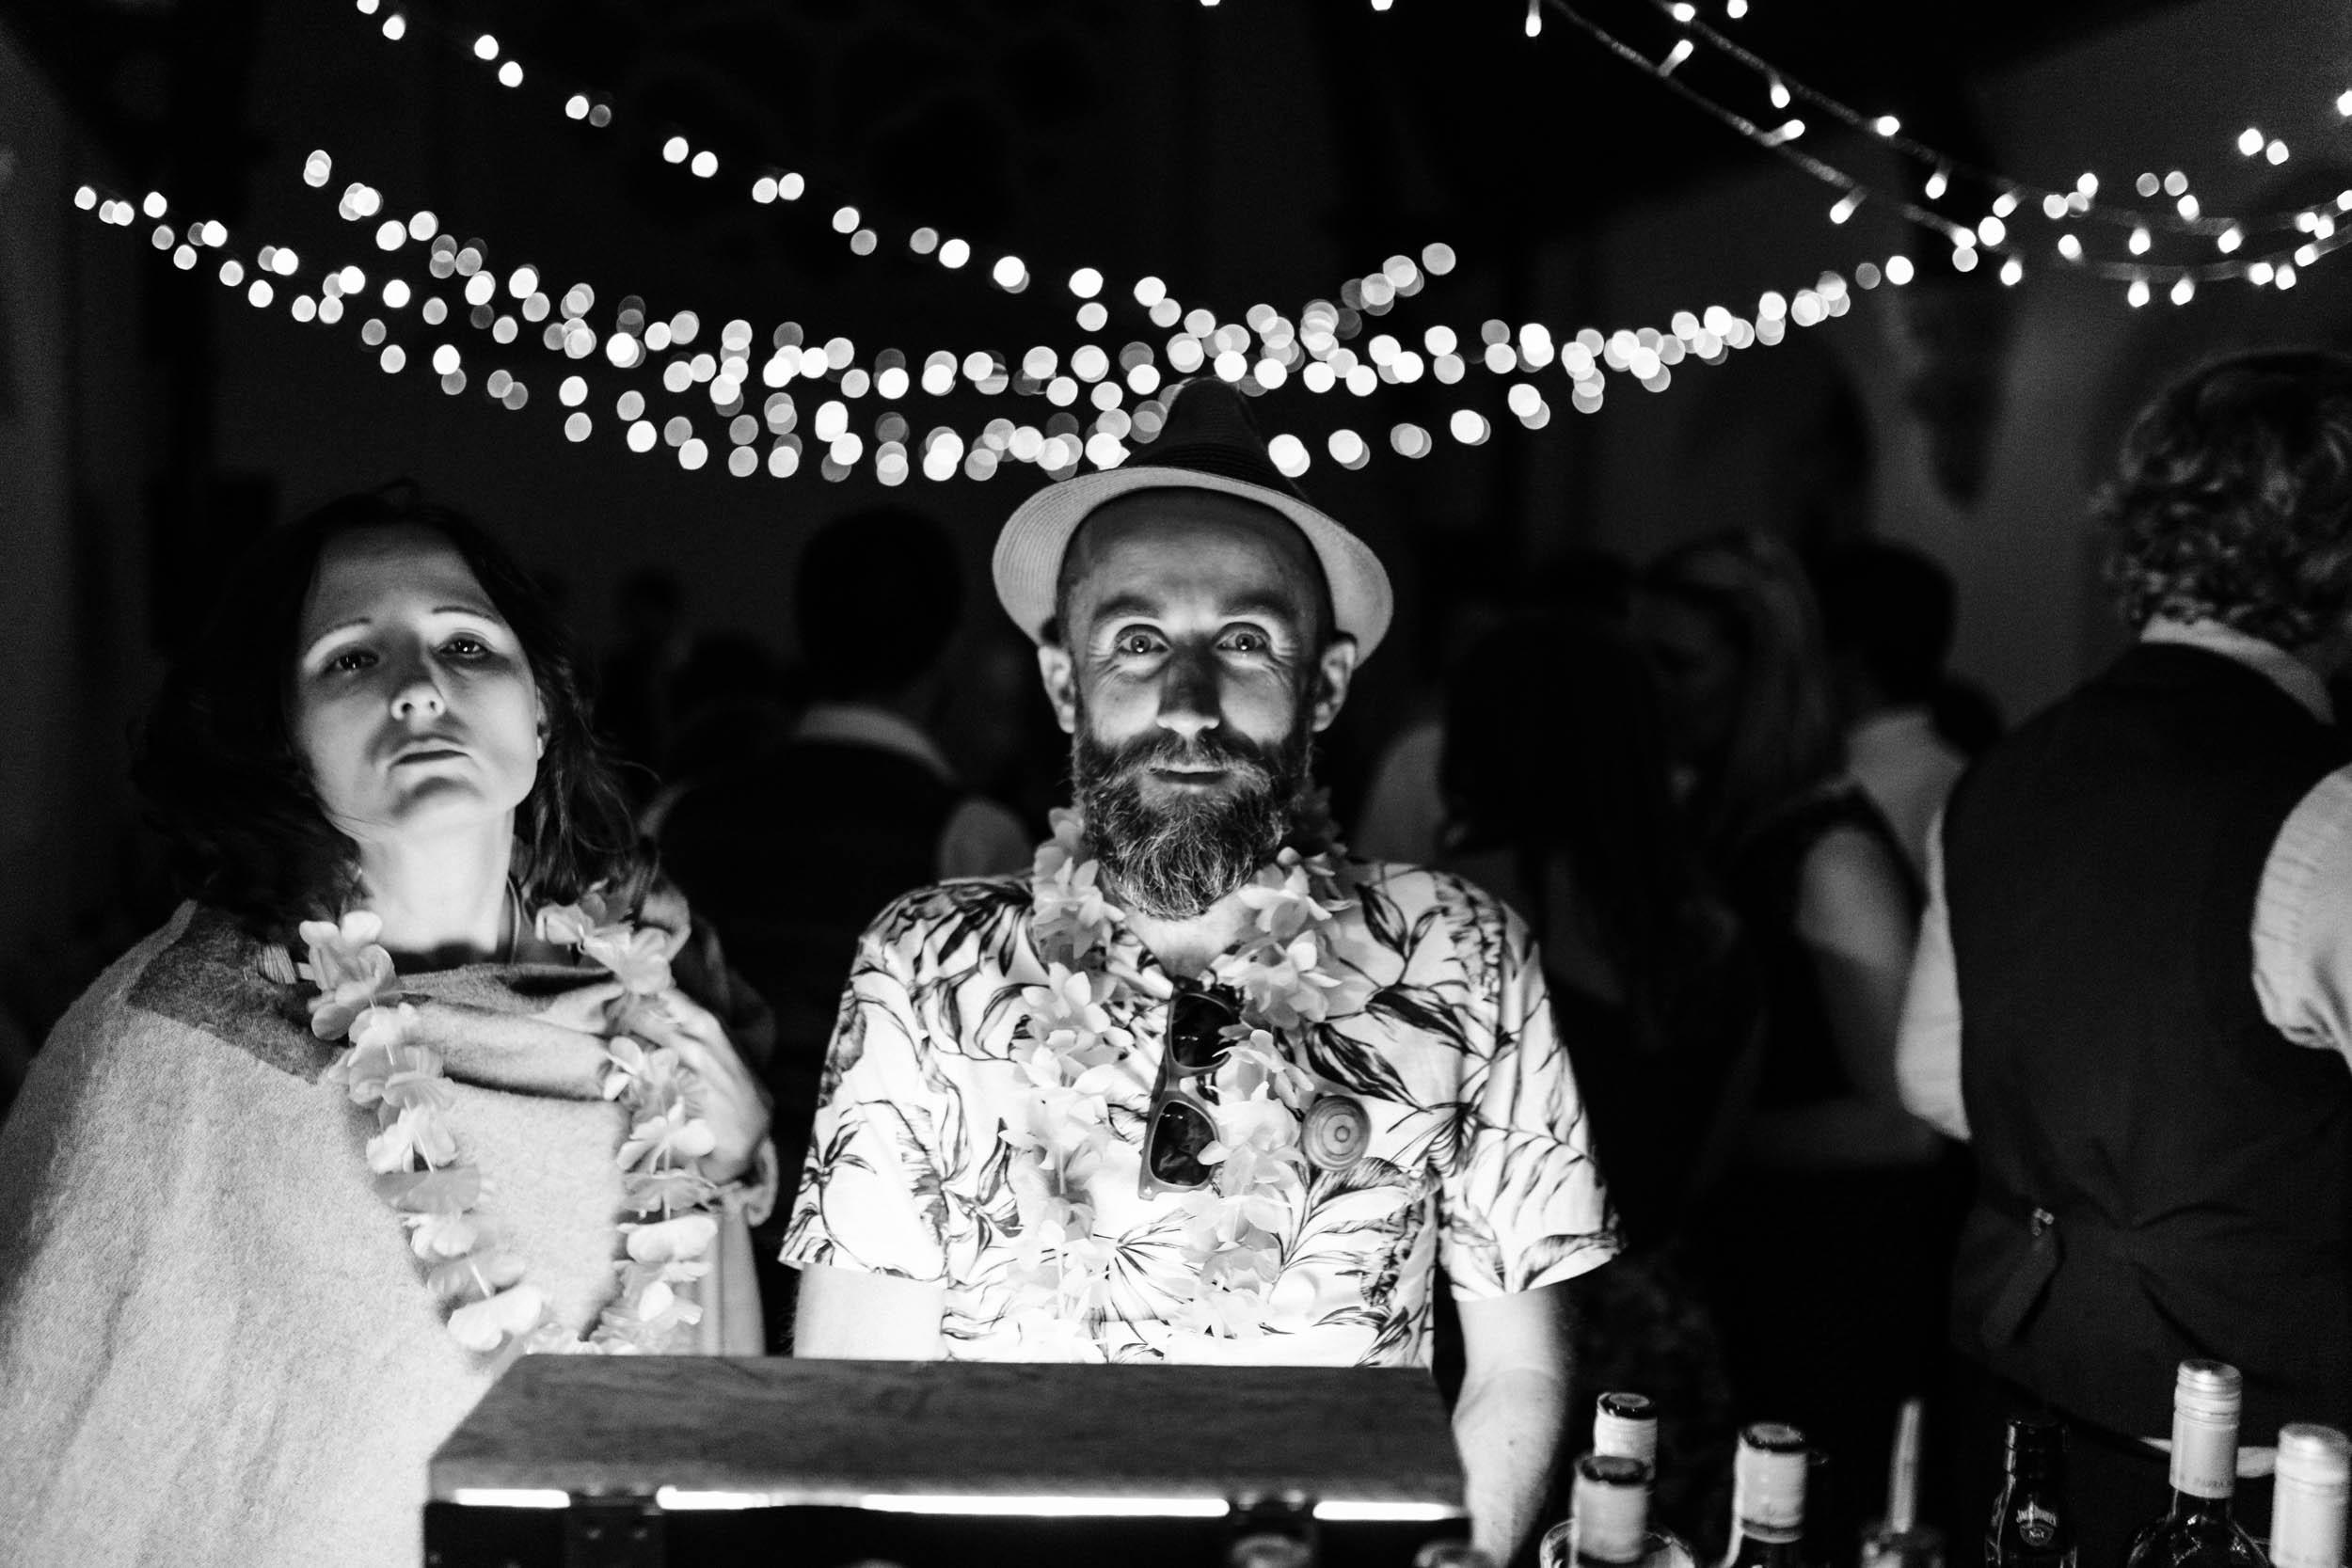 Alex_Sedgmond_Photography-SouthWalesWeddingPhotography-Wedding-Photographer-Cardiff-40.jpg